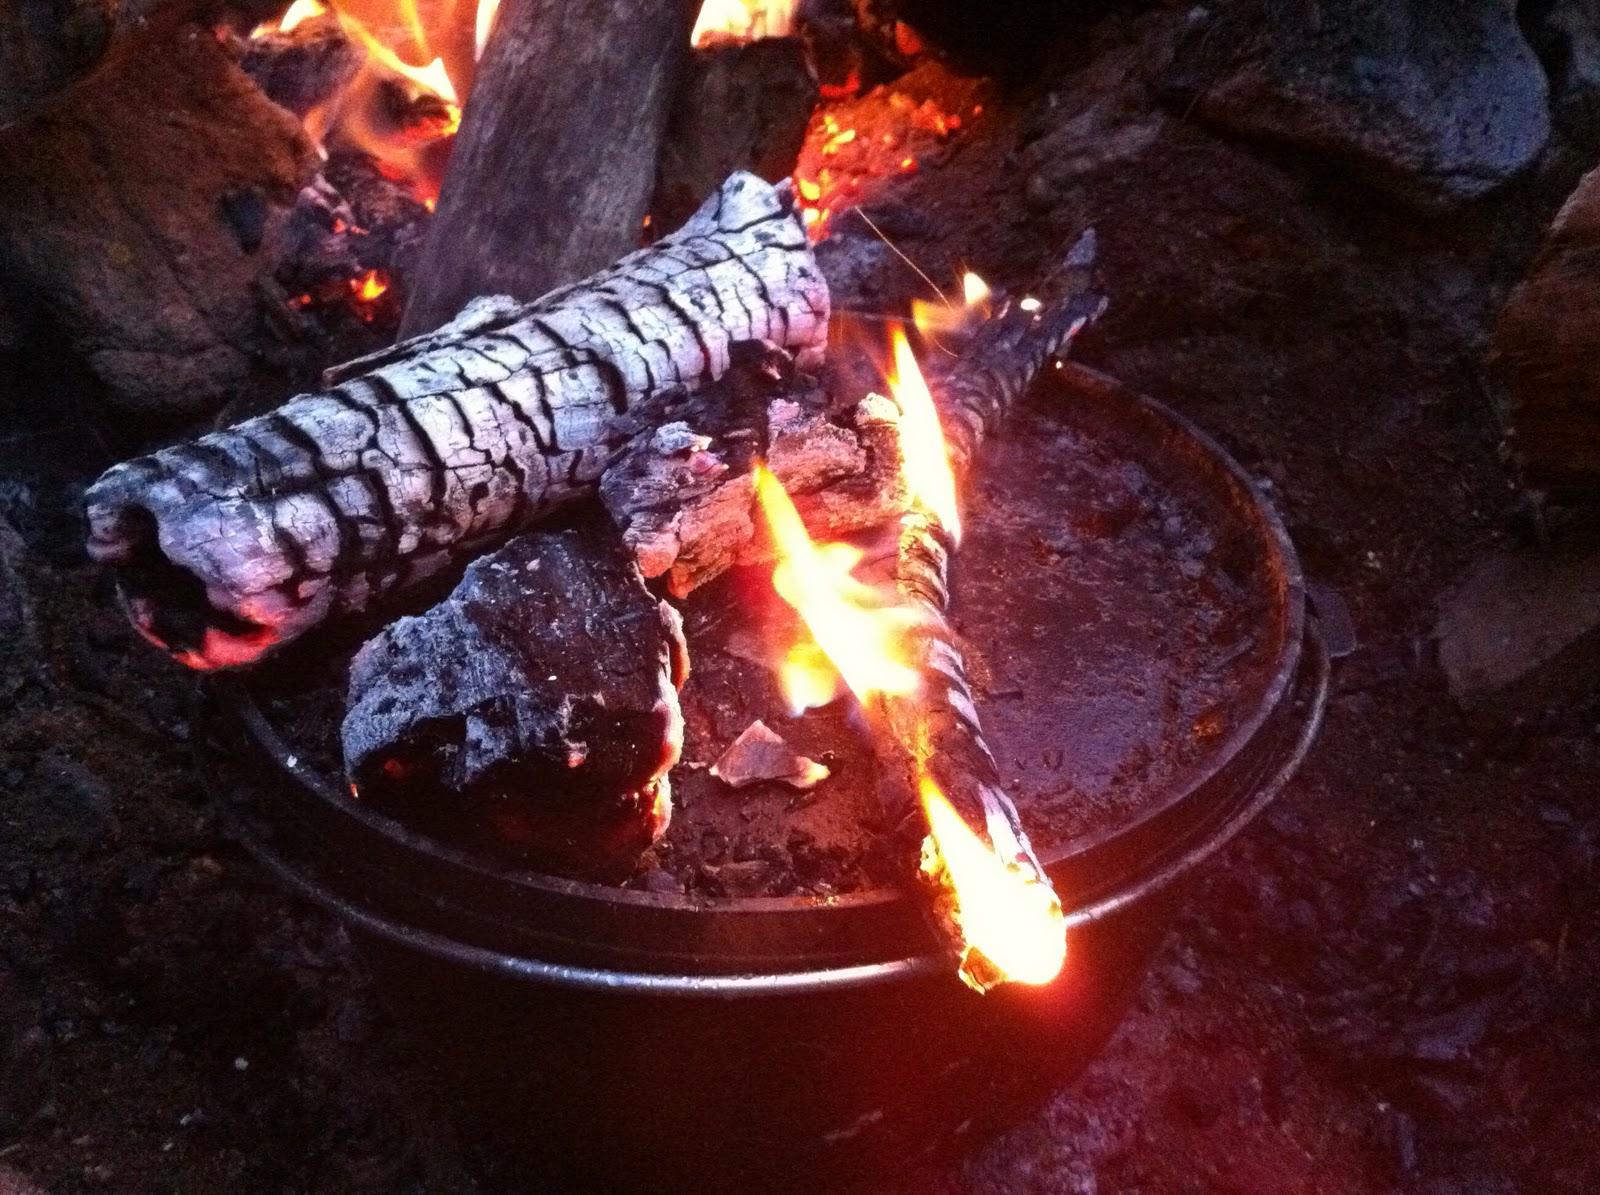 derek on cast iron cast iron recipes article campfire